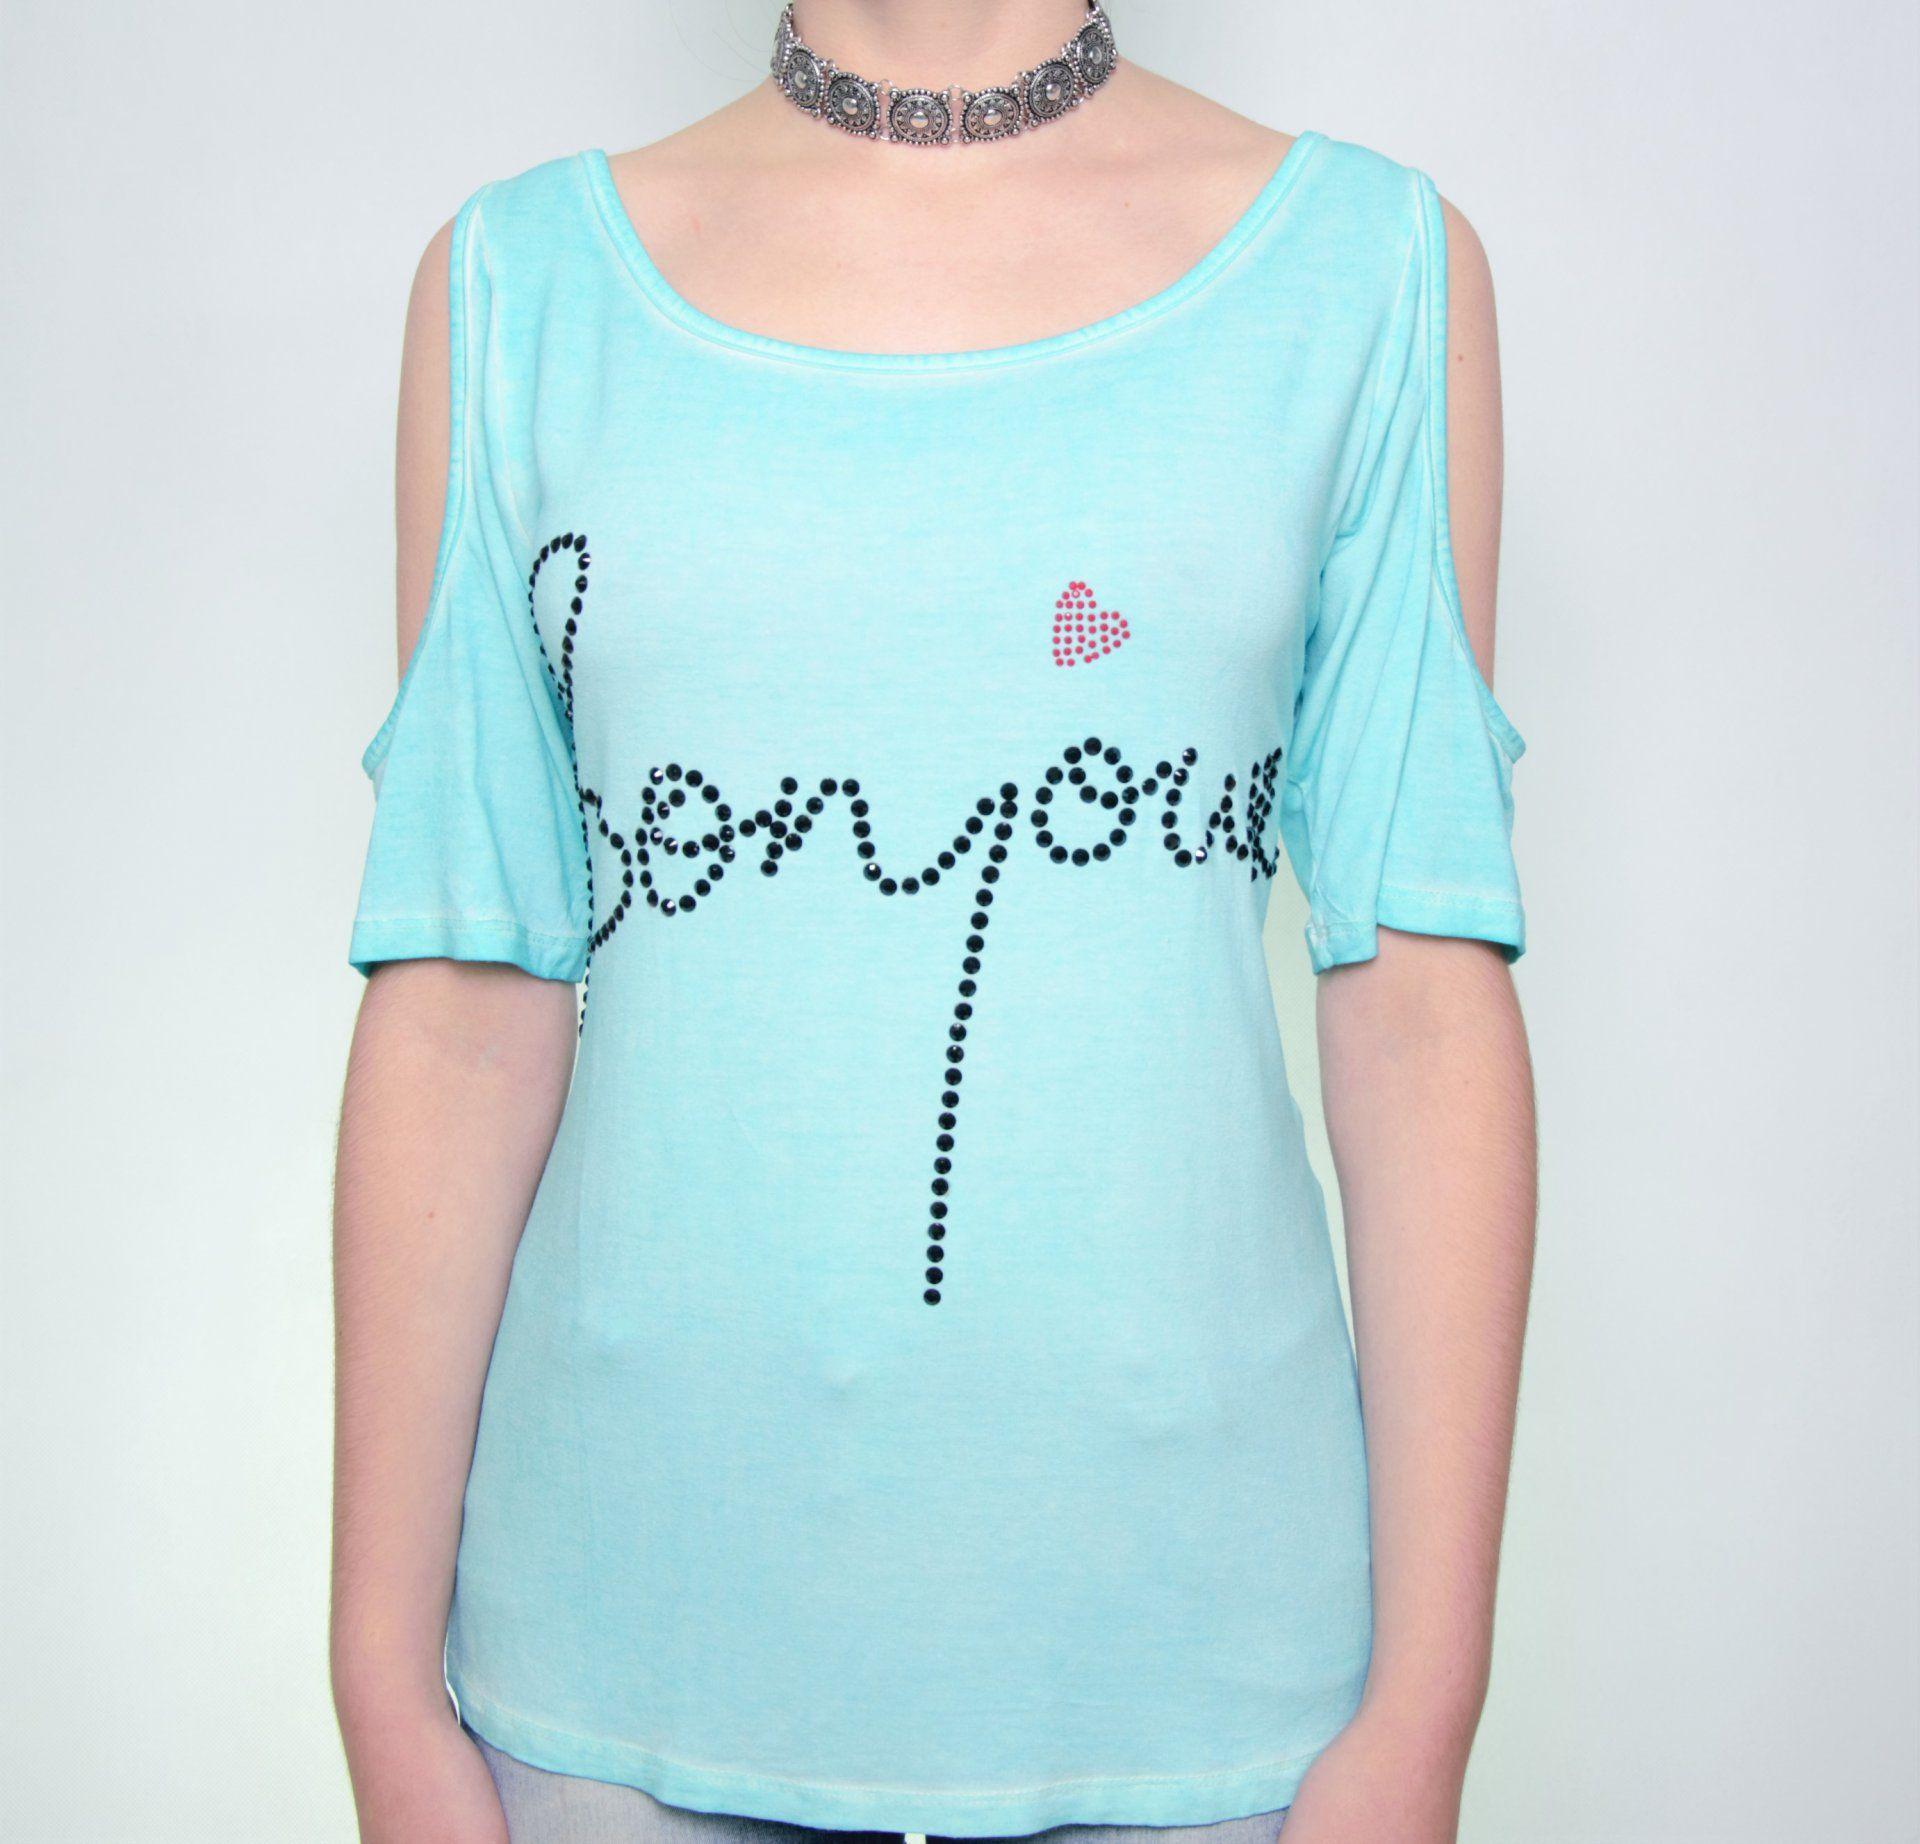 t-shirt-divino-ombro-vazado-103vf17